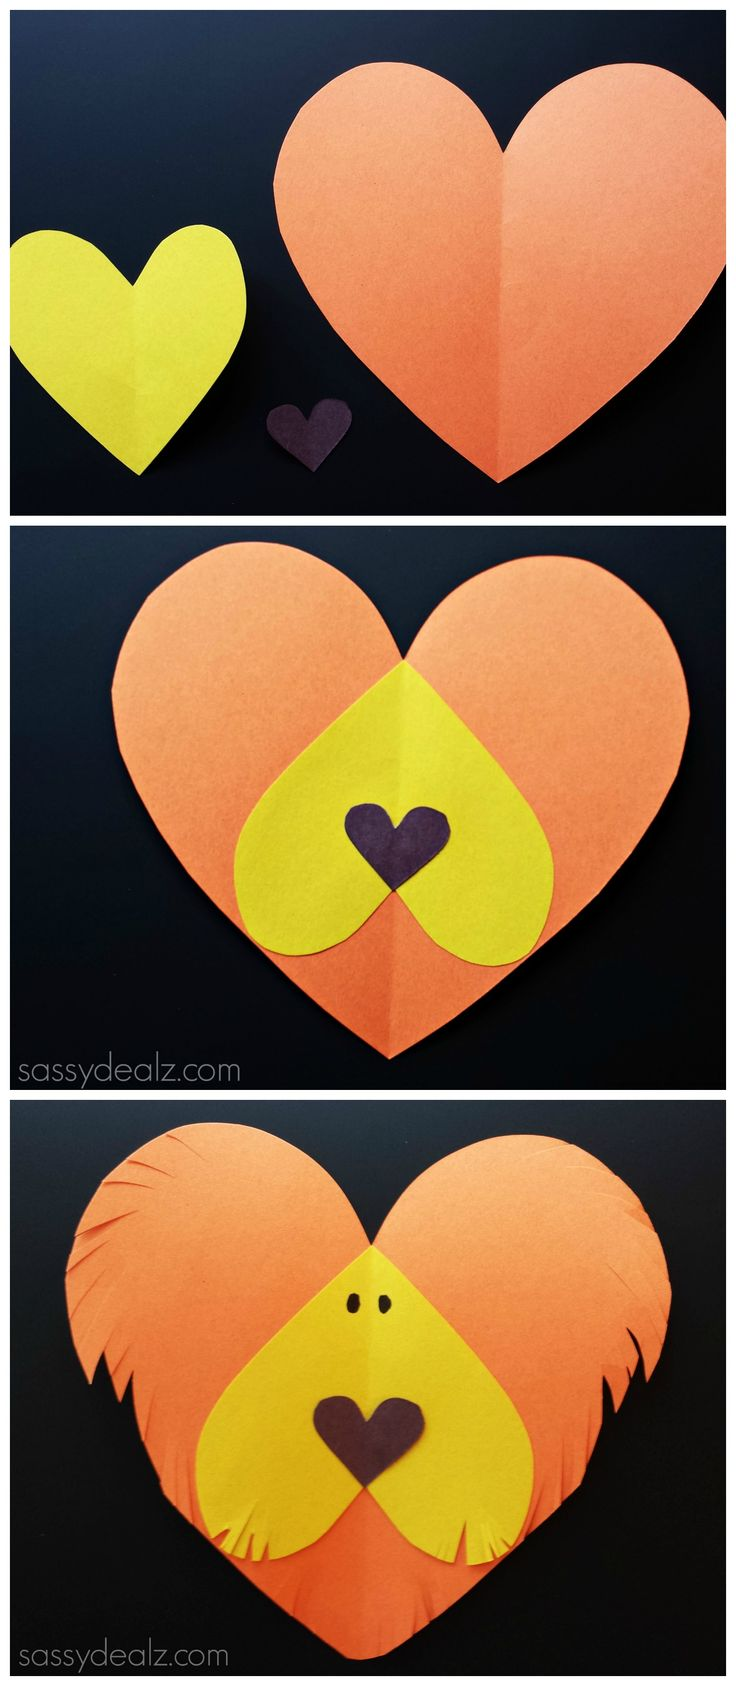 Heart-shaped clipart basic shape #9